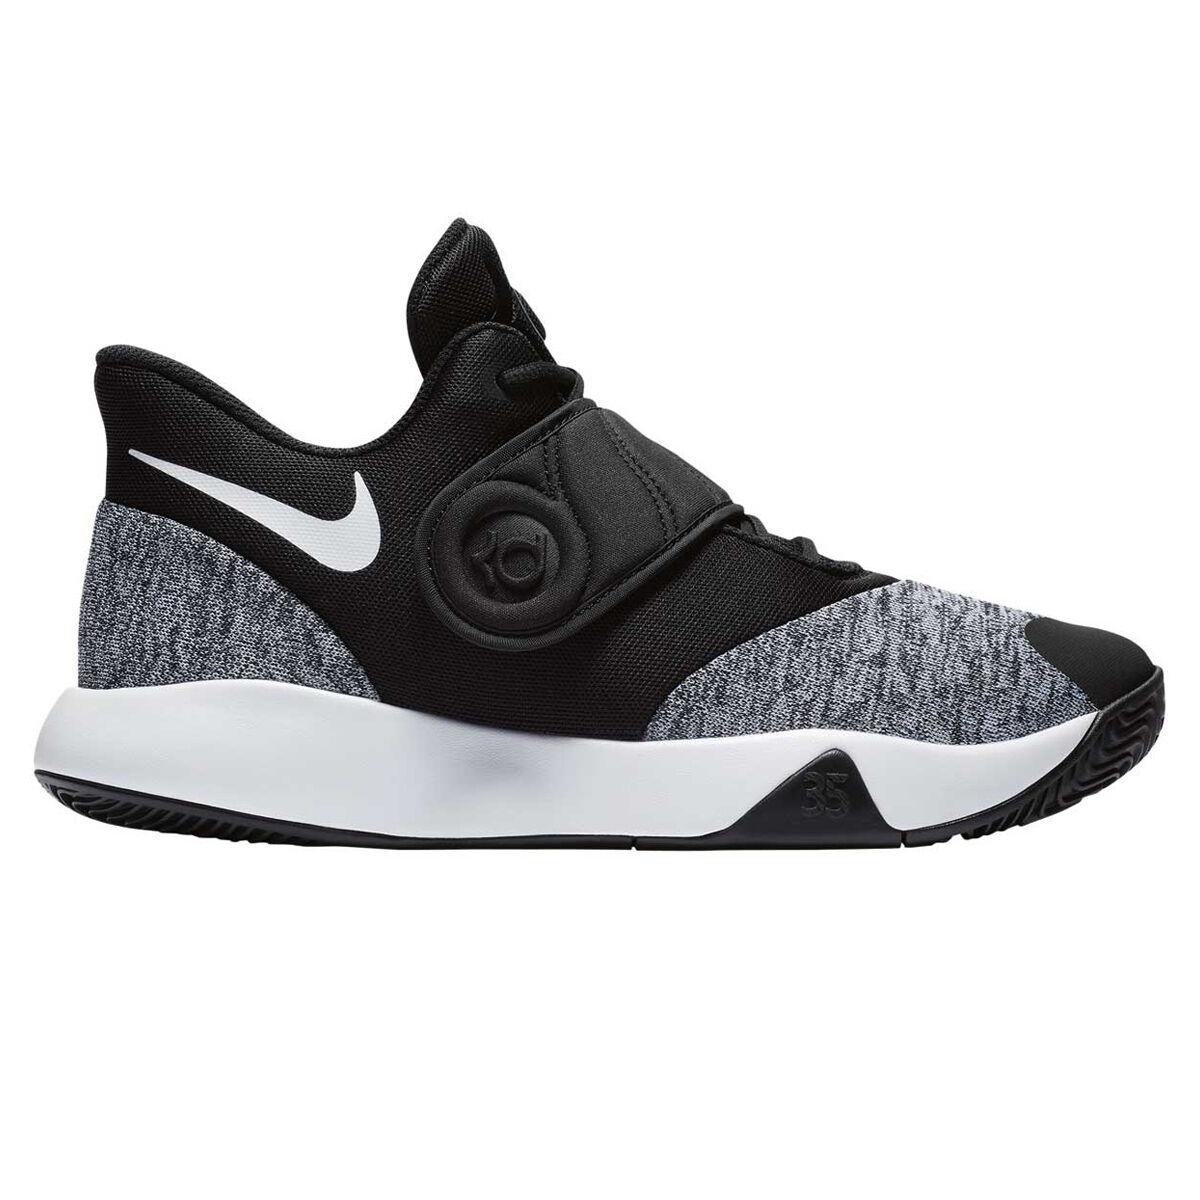 buy popular 8783d 91321 ... top quality nike kd trey 5 vi mens basketball shoes black white rebelhi  res a52c9 d1c2c